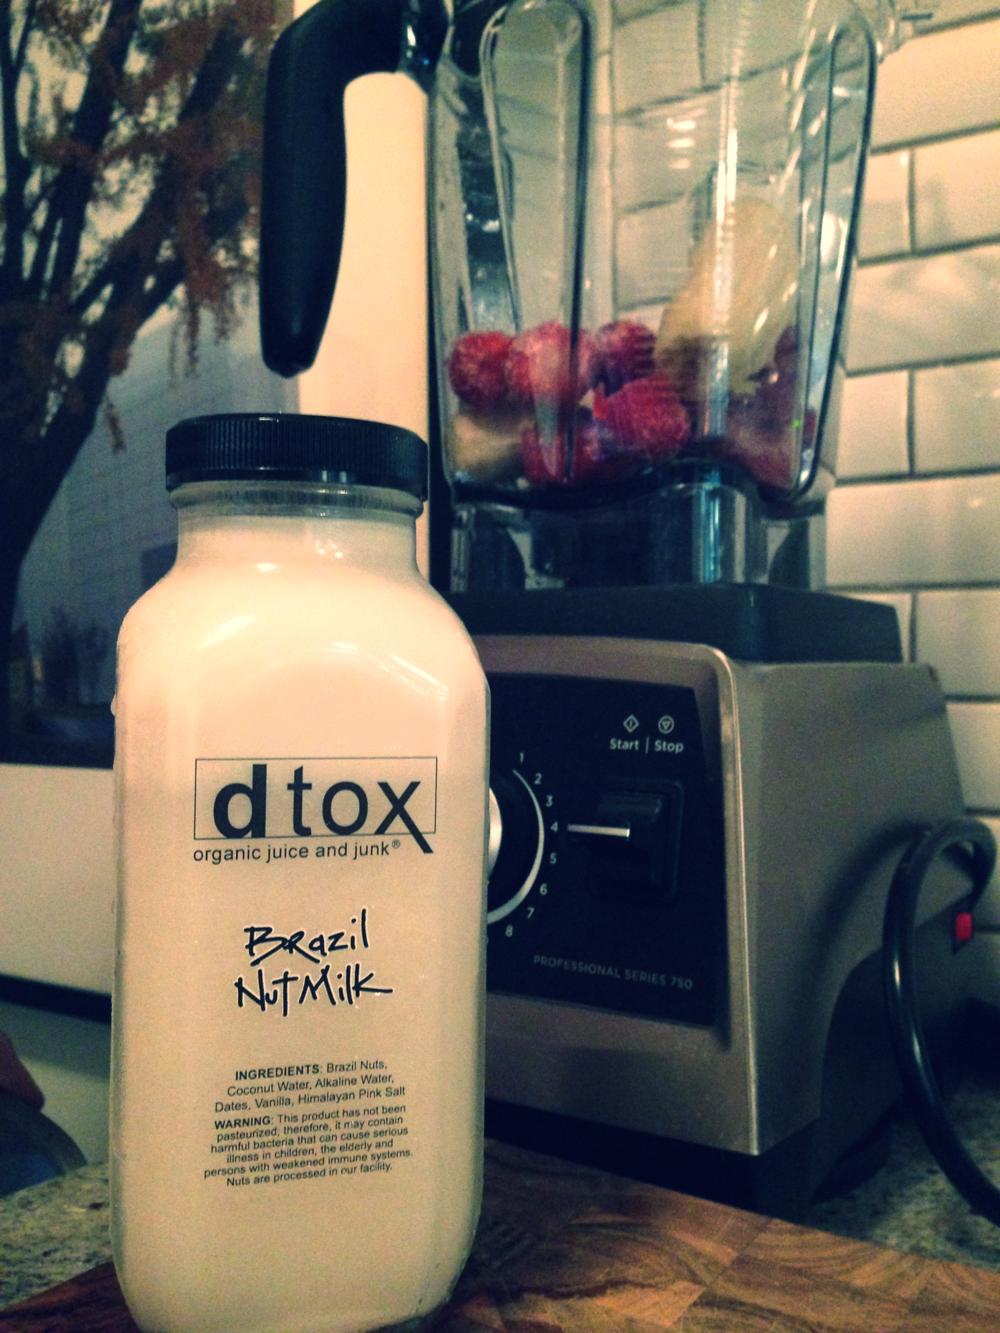 DTOX Brazil Nut Milk